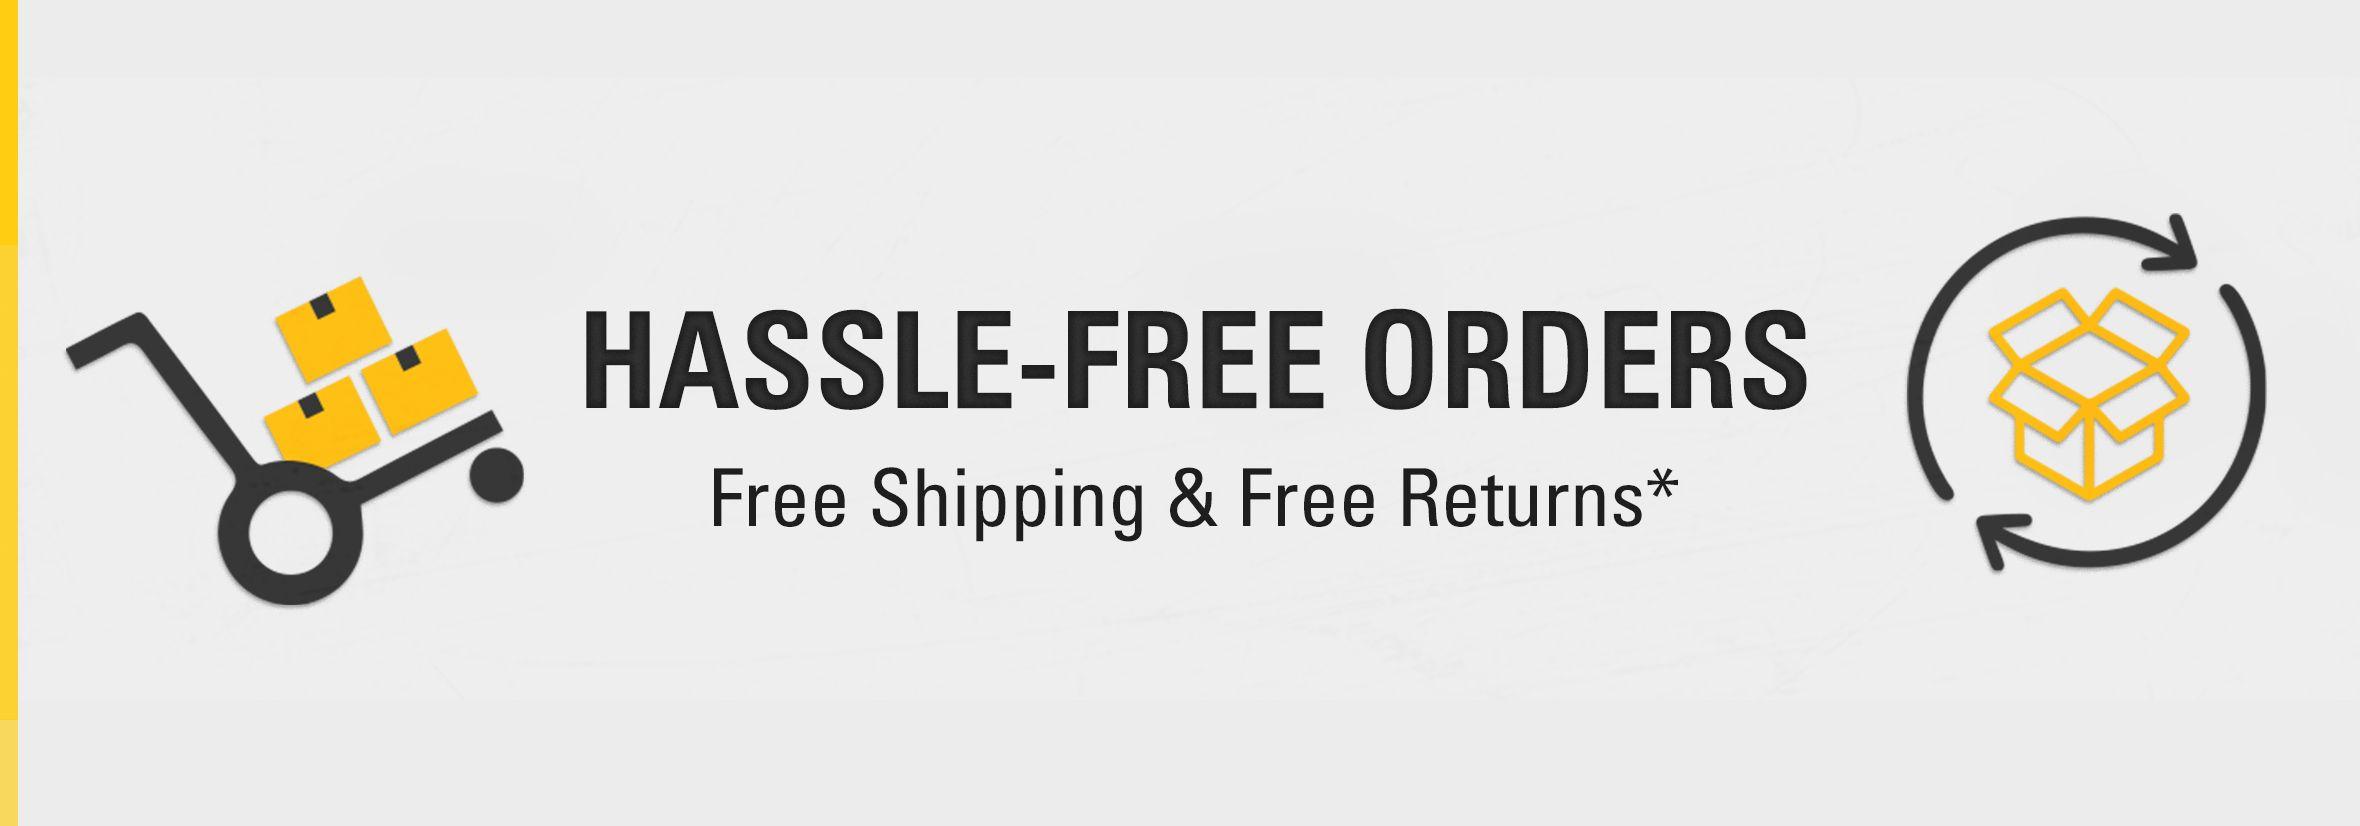 Hassle-free orders